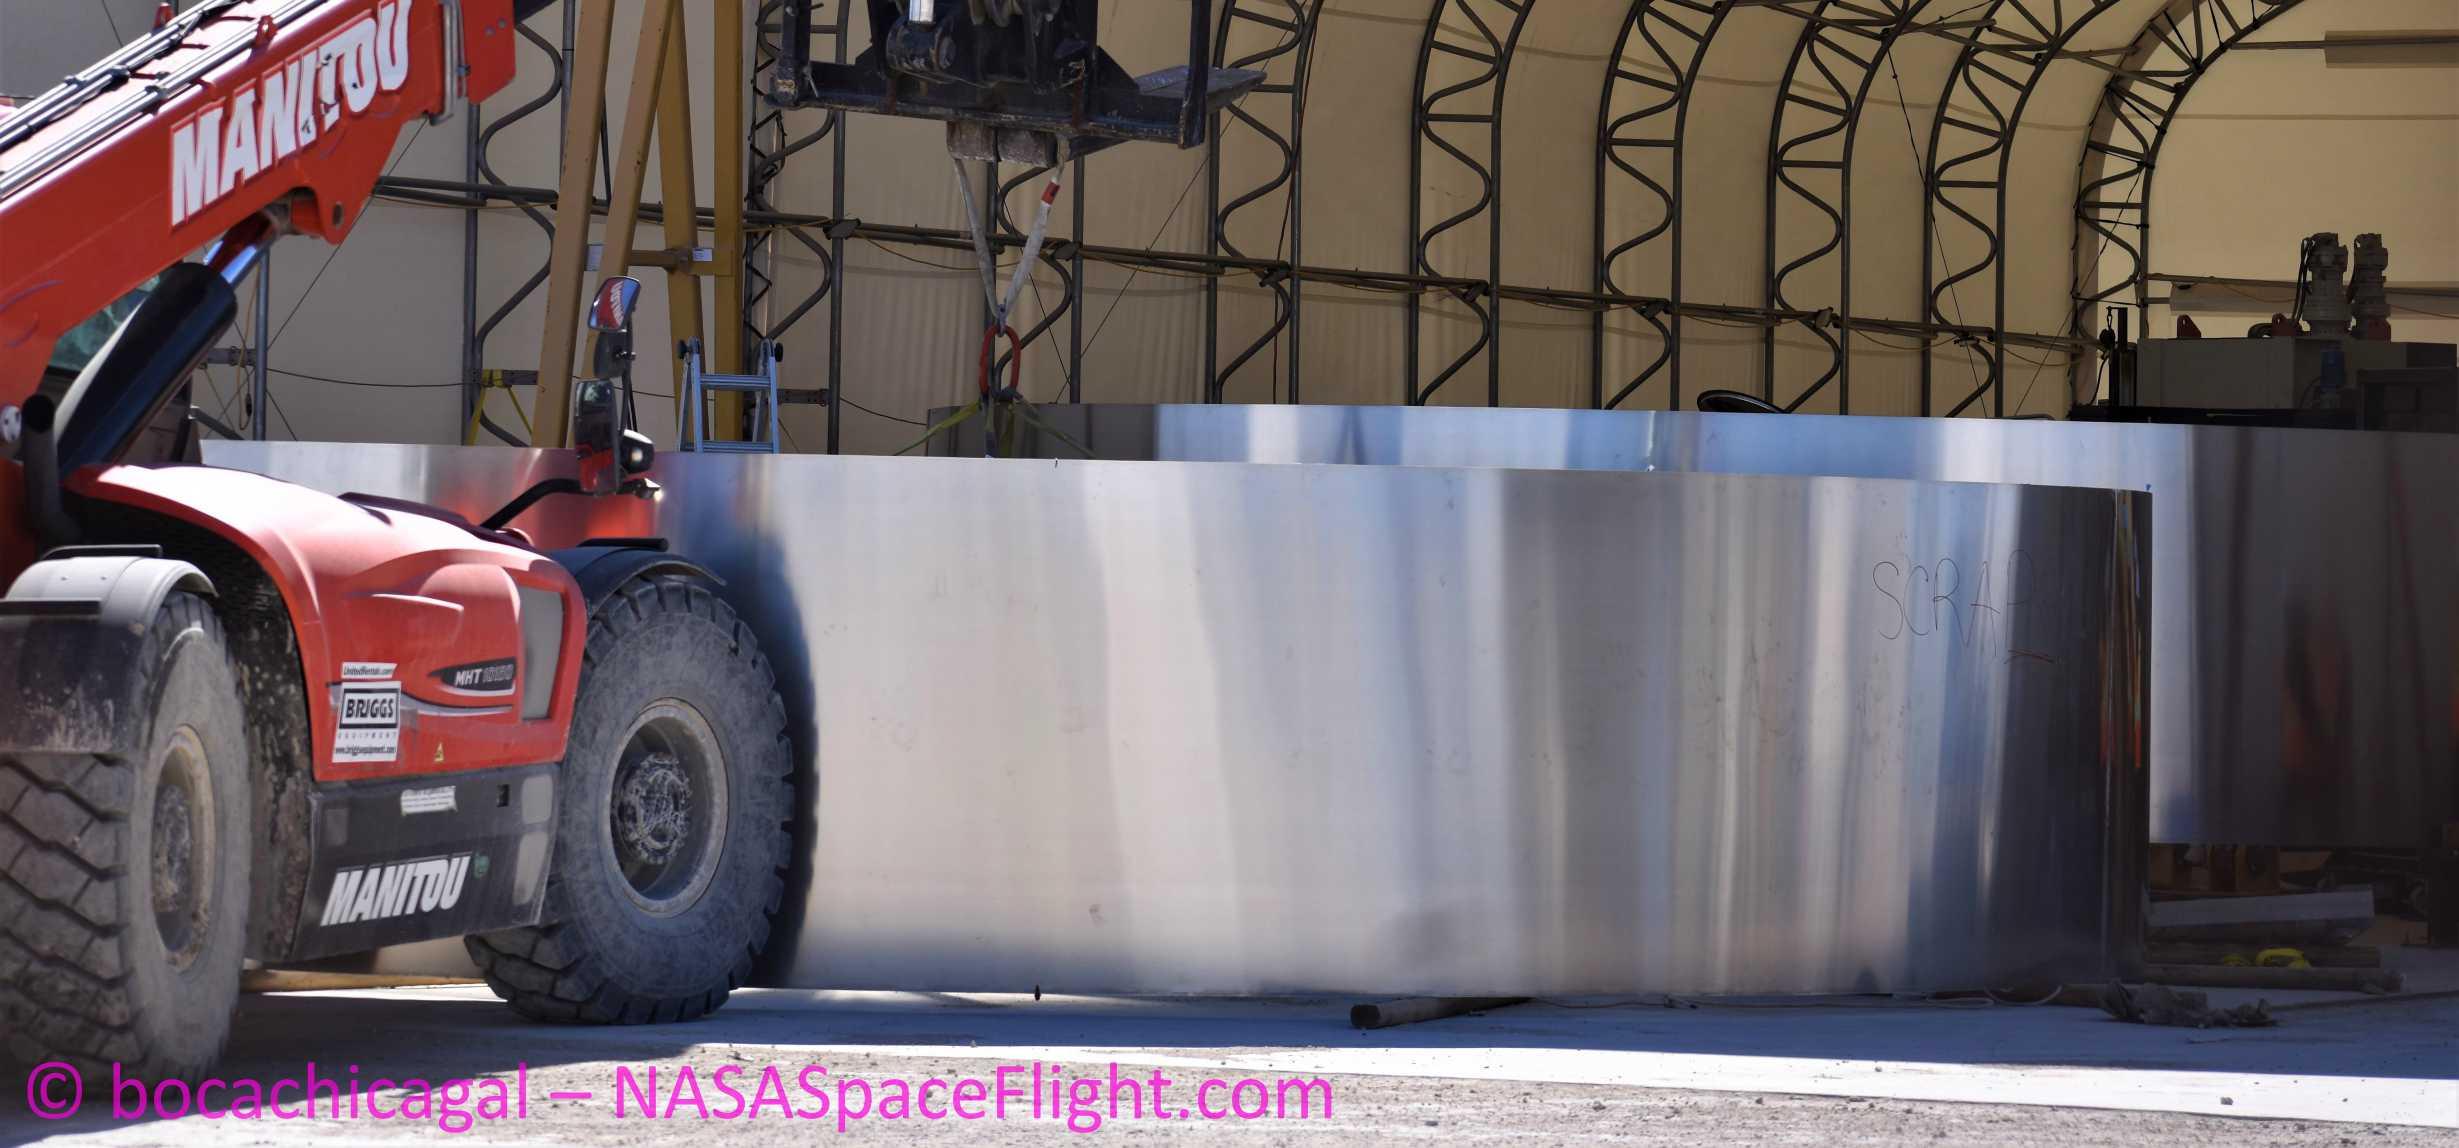 Starship Boca Chica 020620 (NASASpaceflight – bocachicagal) SN01 ring work 1 crop (c)